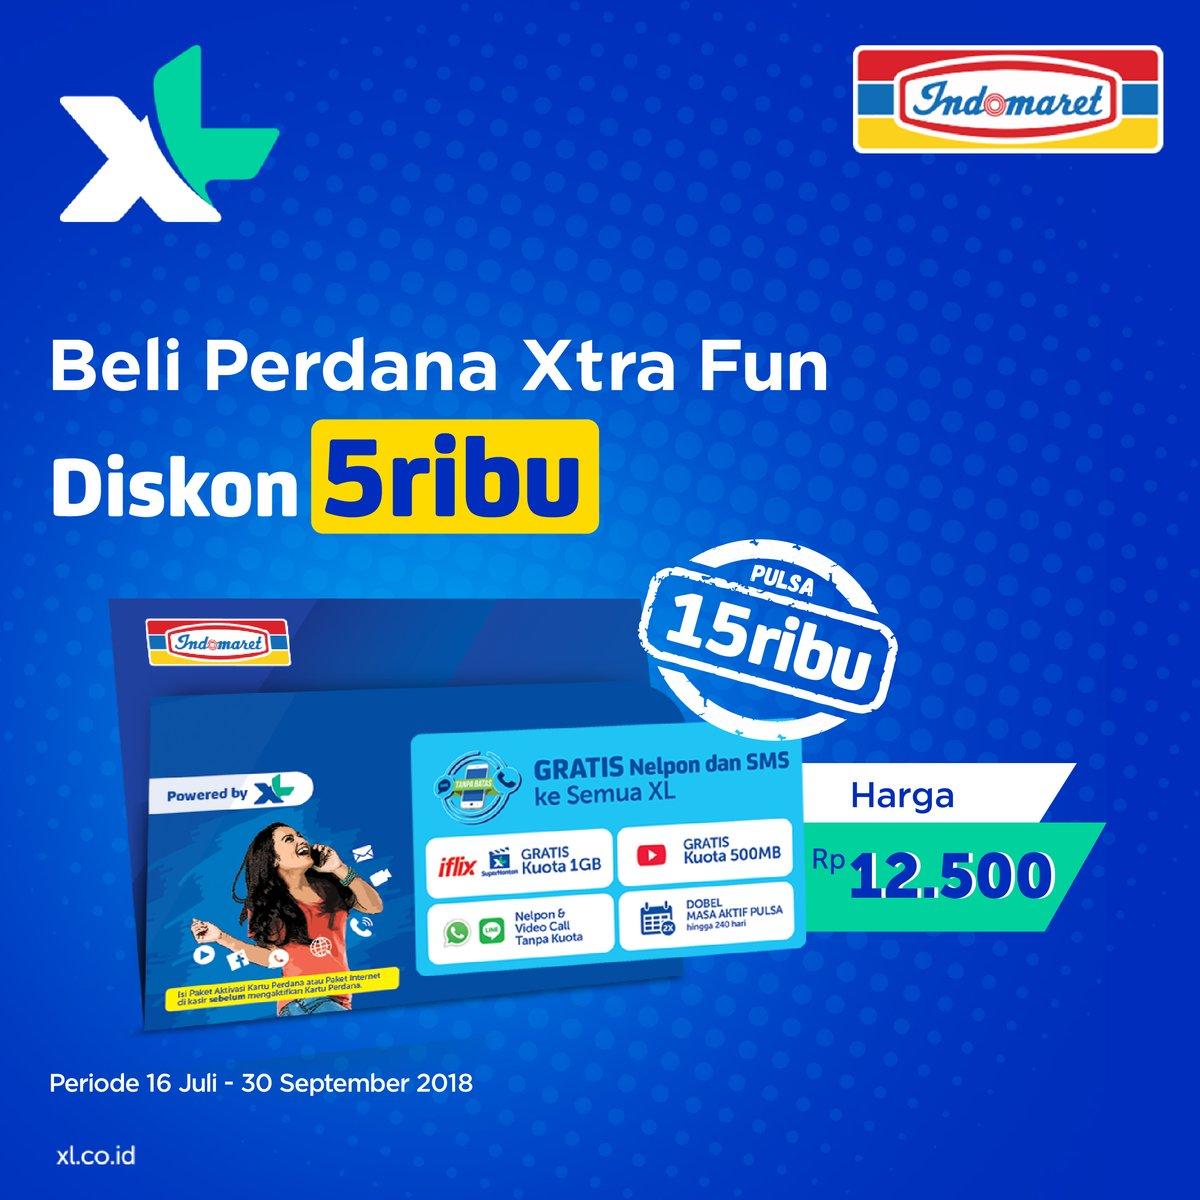 Indomaret - Promo Beli Perdana Xtra Fun Diskon 5 Ribu (s.d 30 Sept 2018)